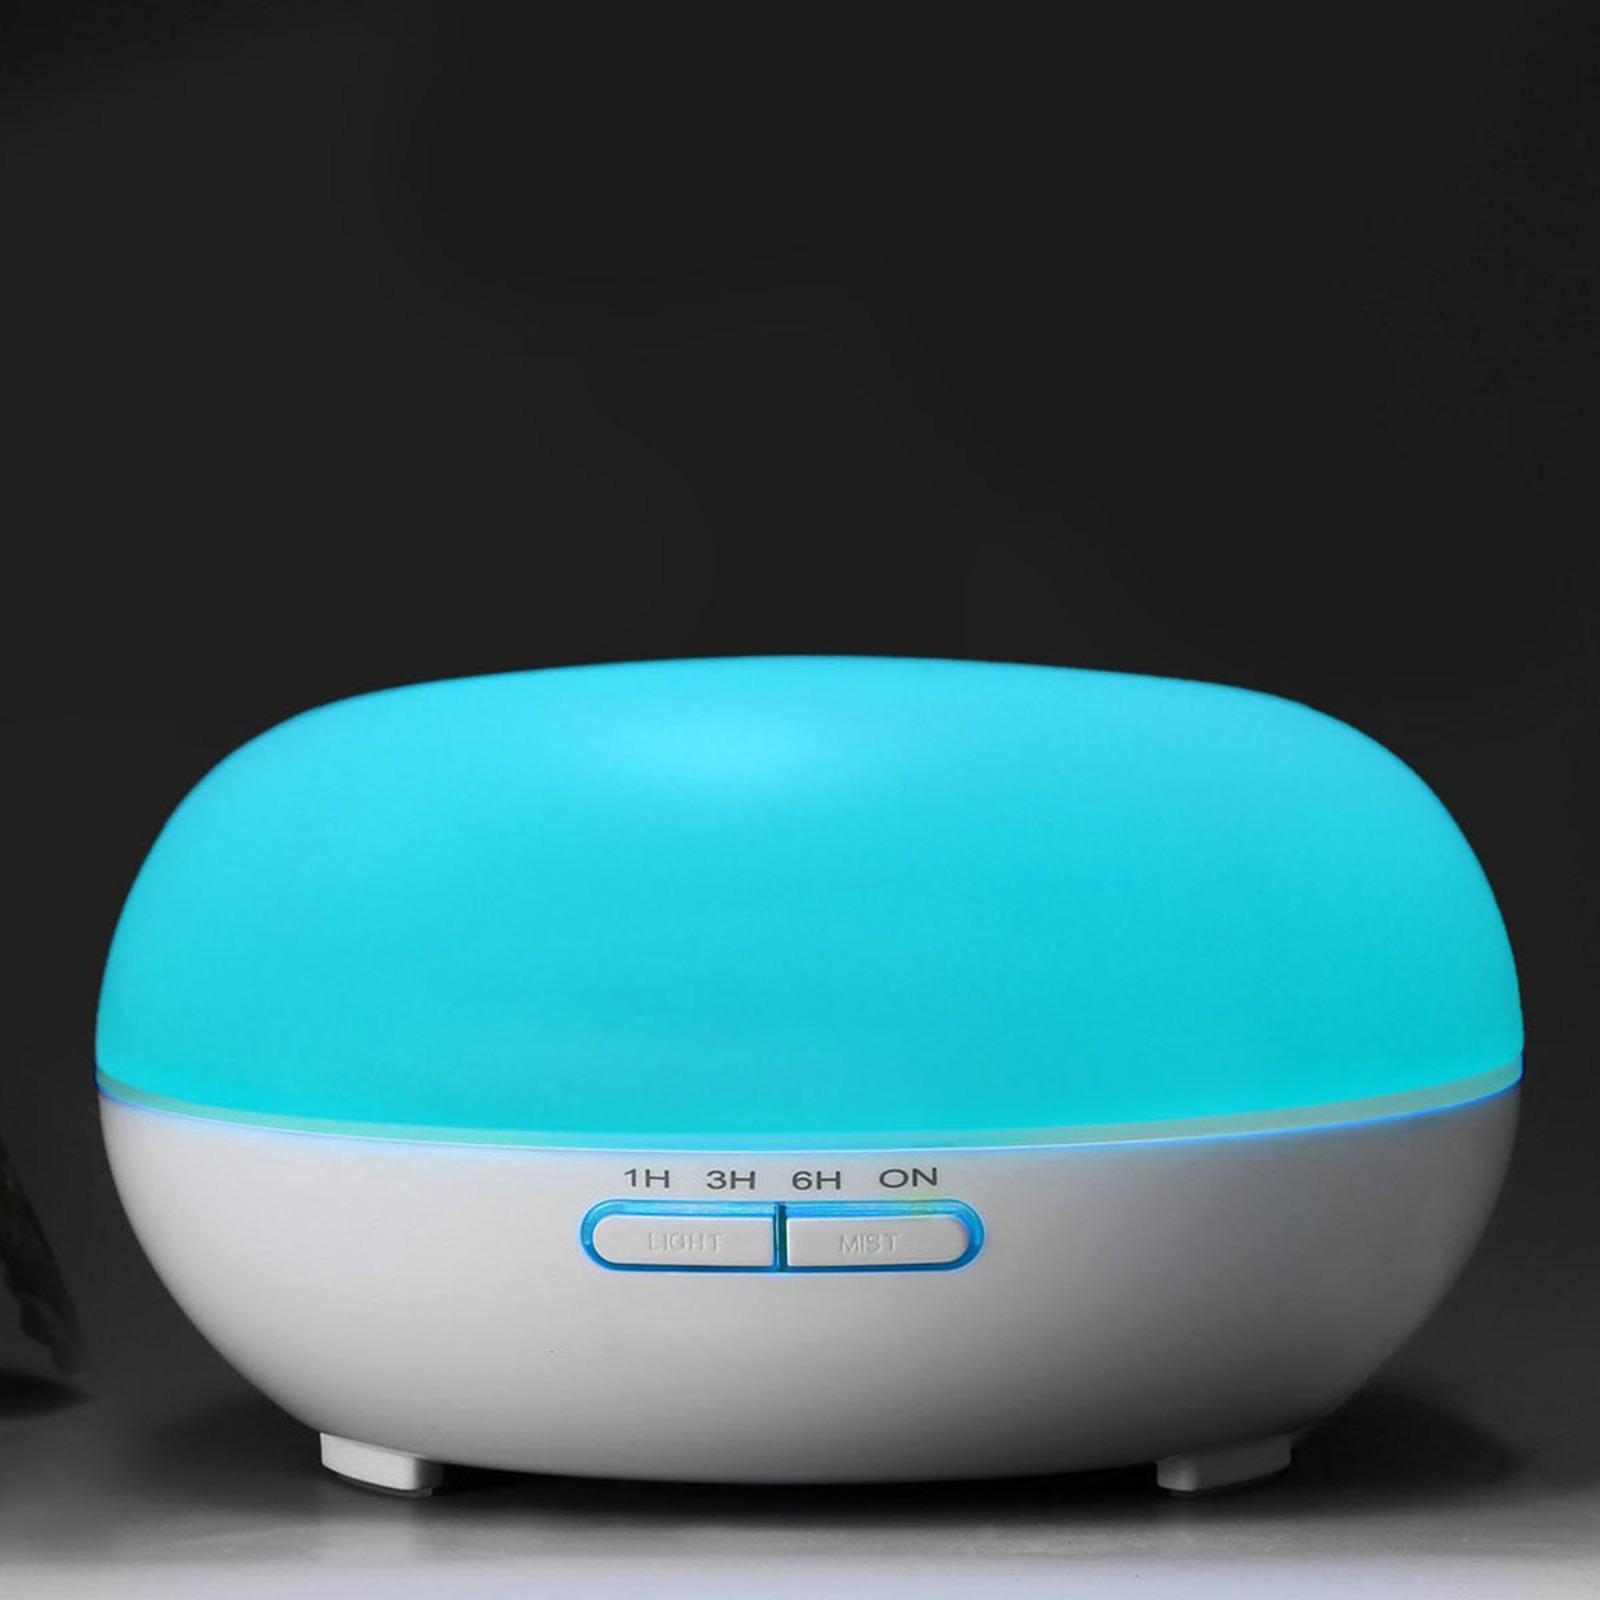 Biofinest C1 Ultrasonic Aroma Diffuser Humidifier